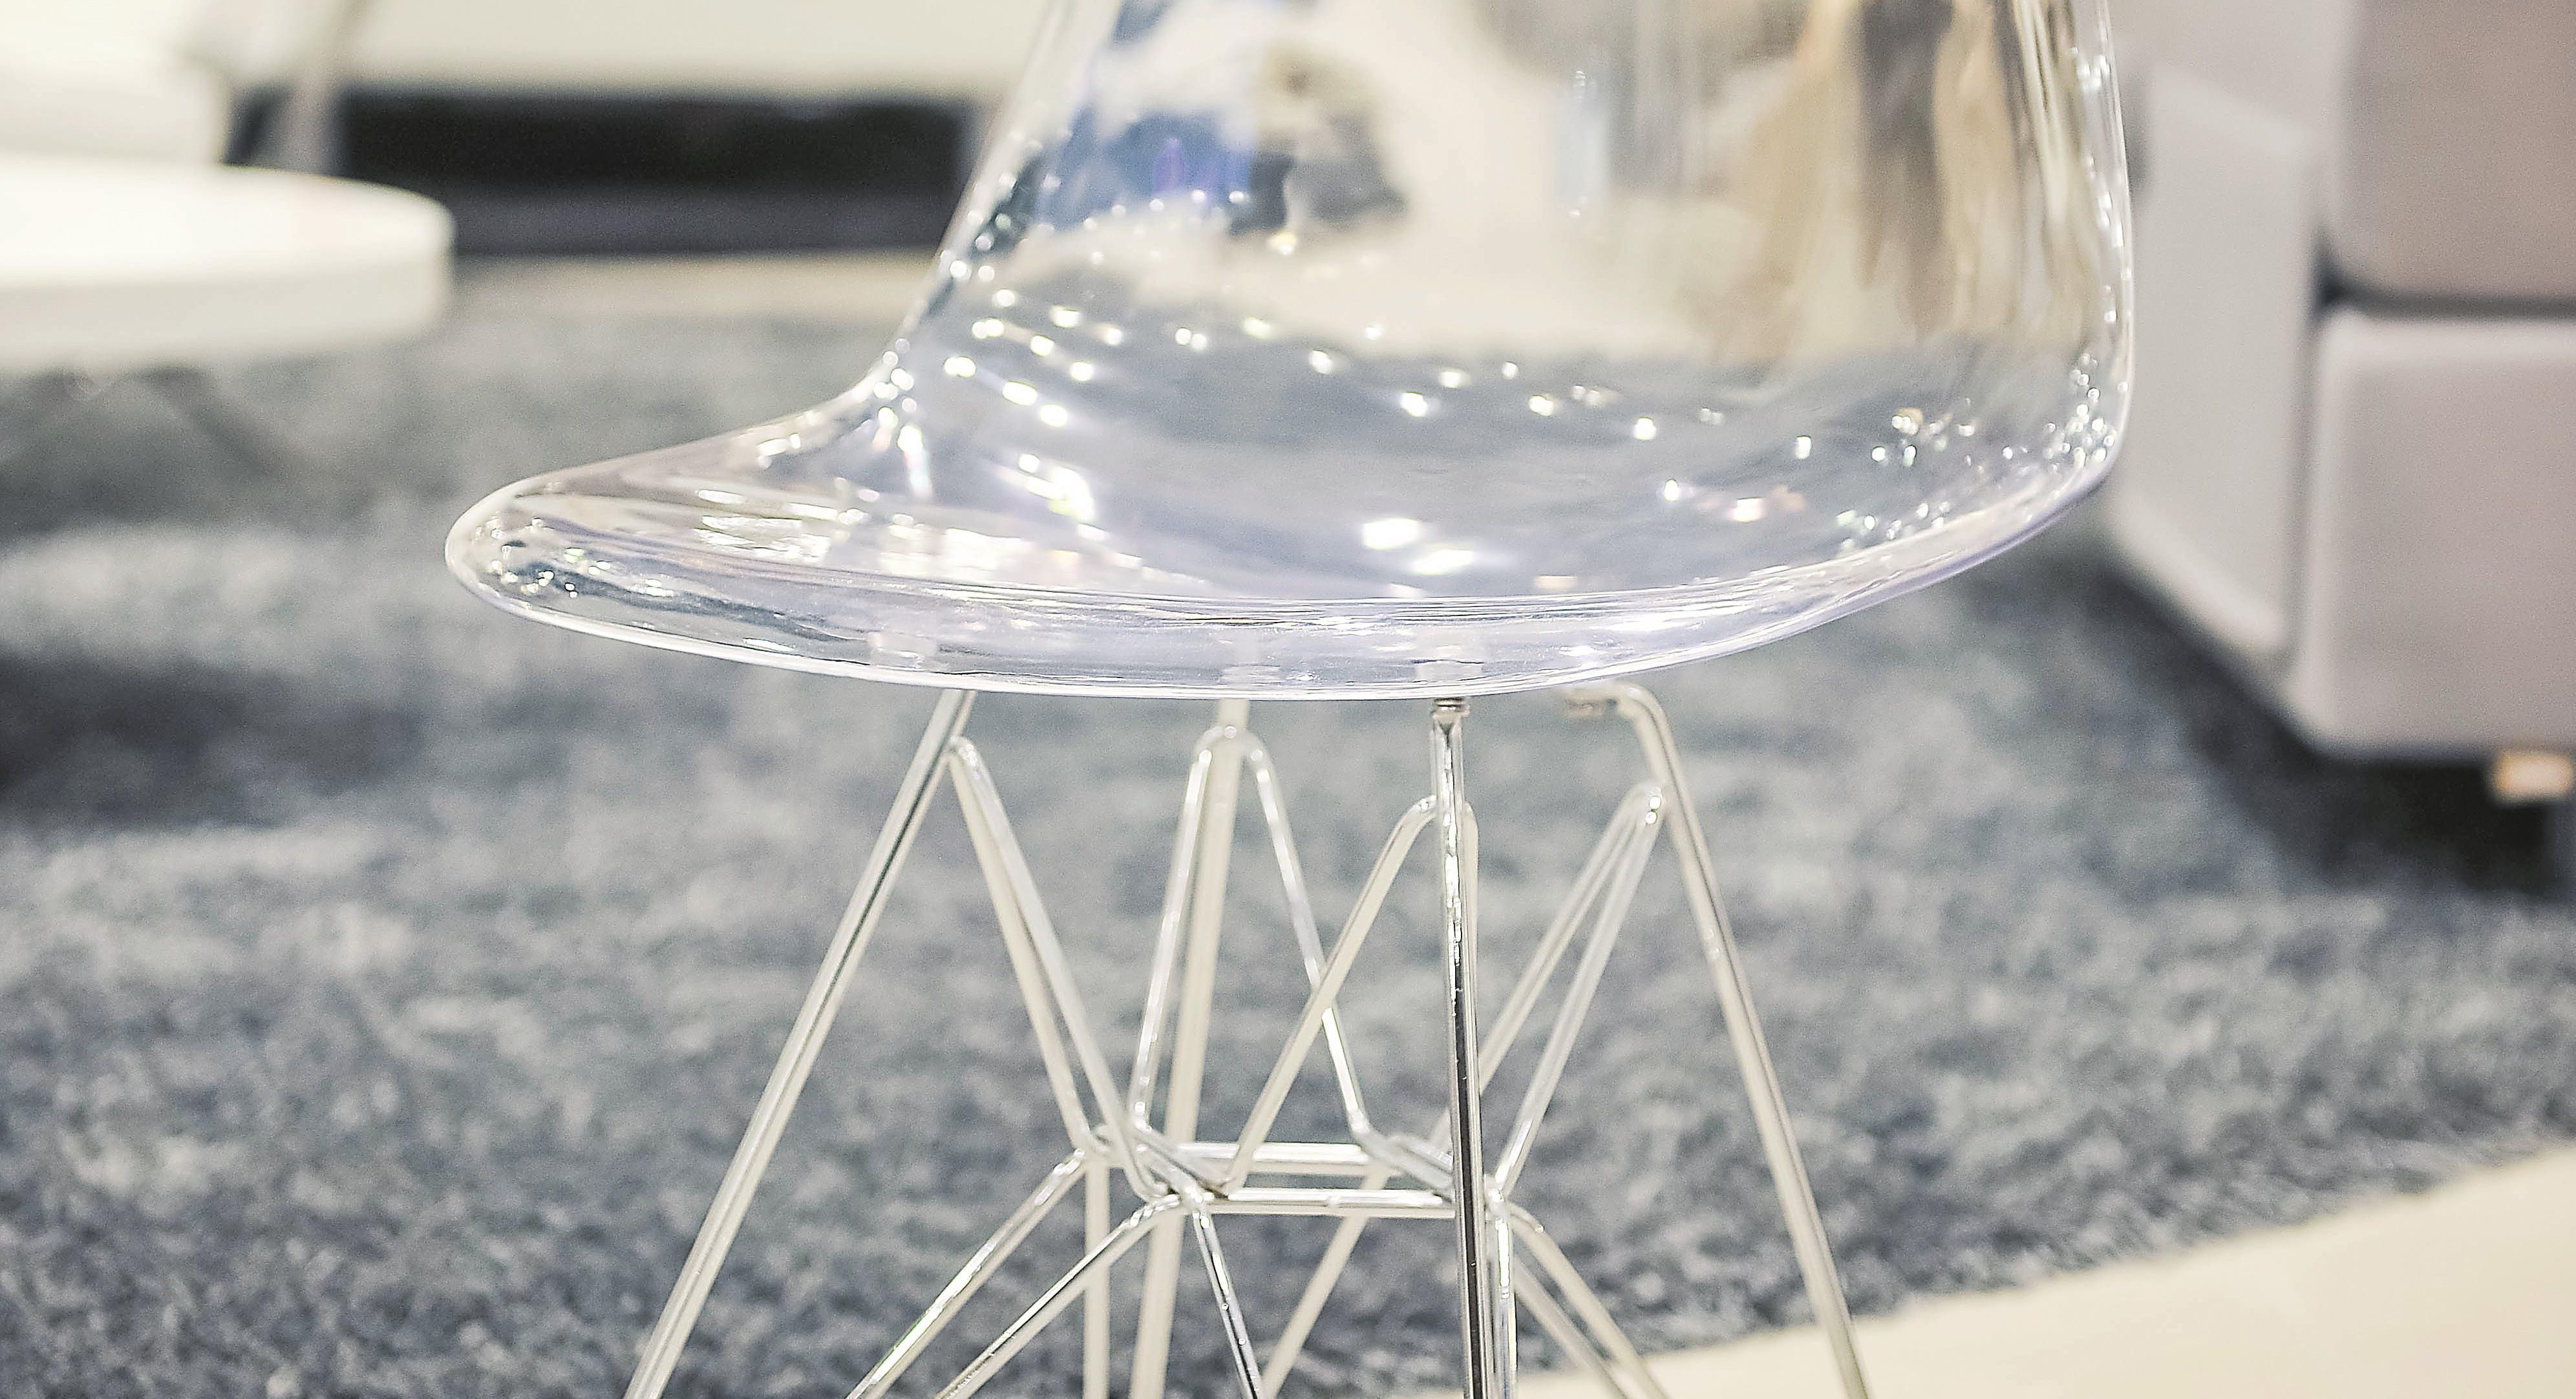 Stolica od prozirnog polikarbonata